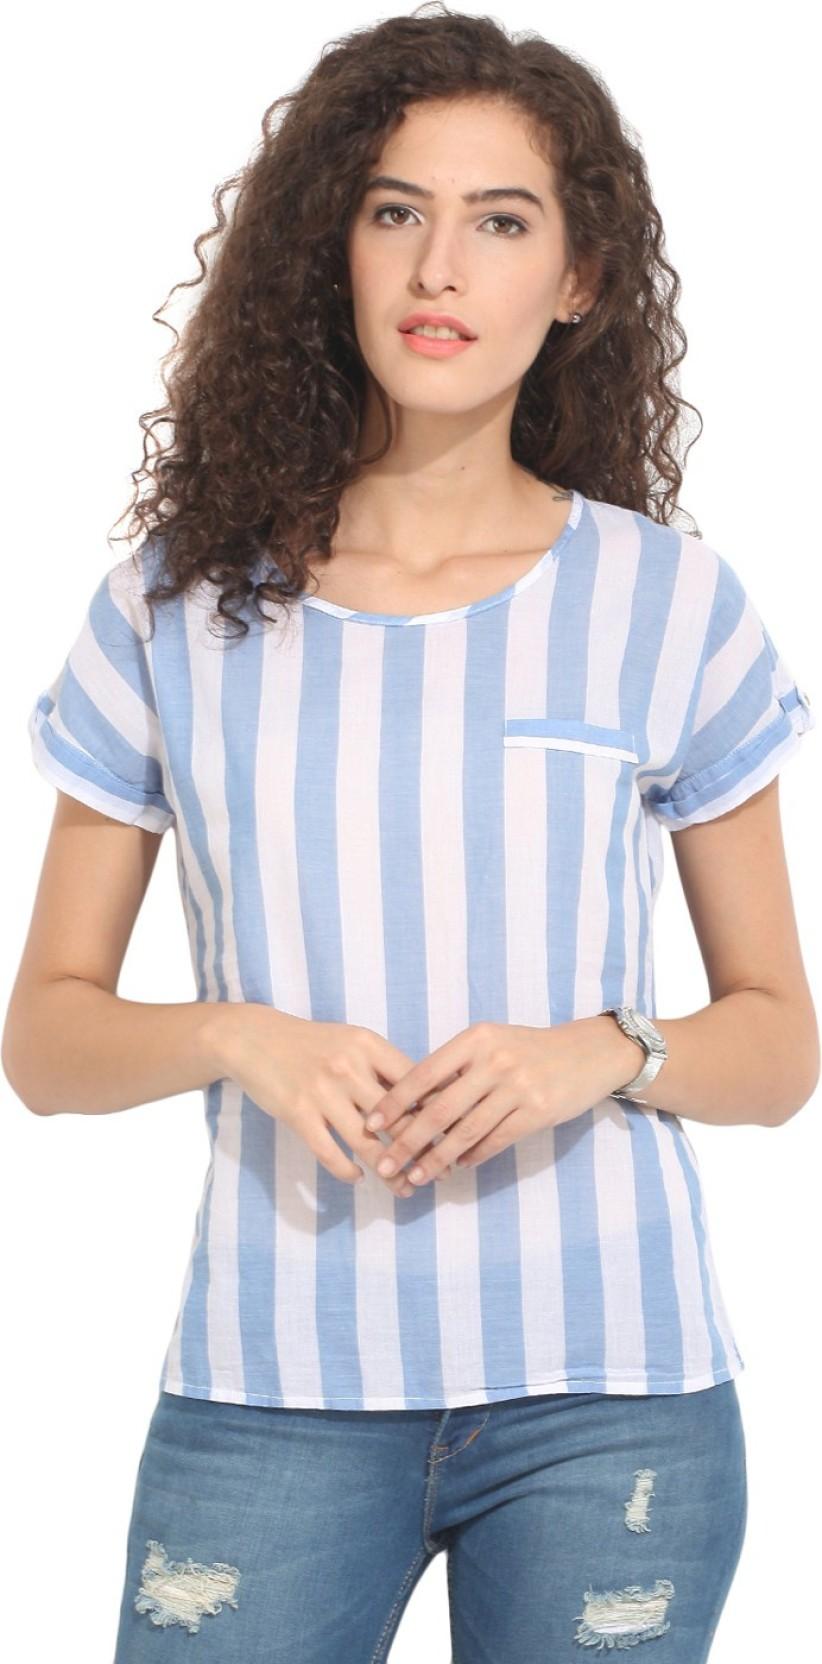 75f398c7f0db79 Hook & Eye Casual Short Sleeve Striped Women's Blue, White Top - Buy ...